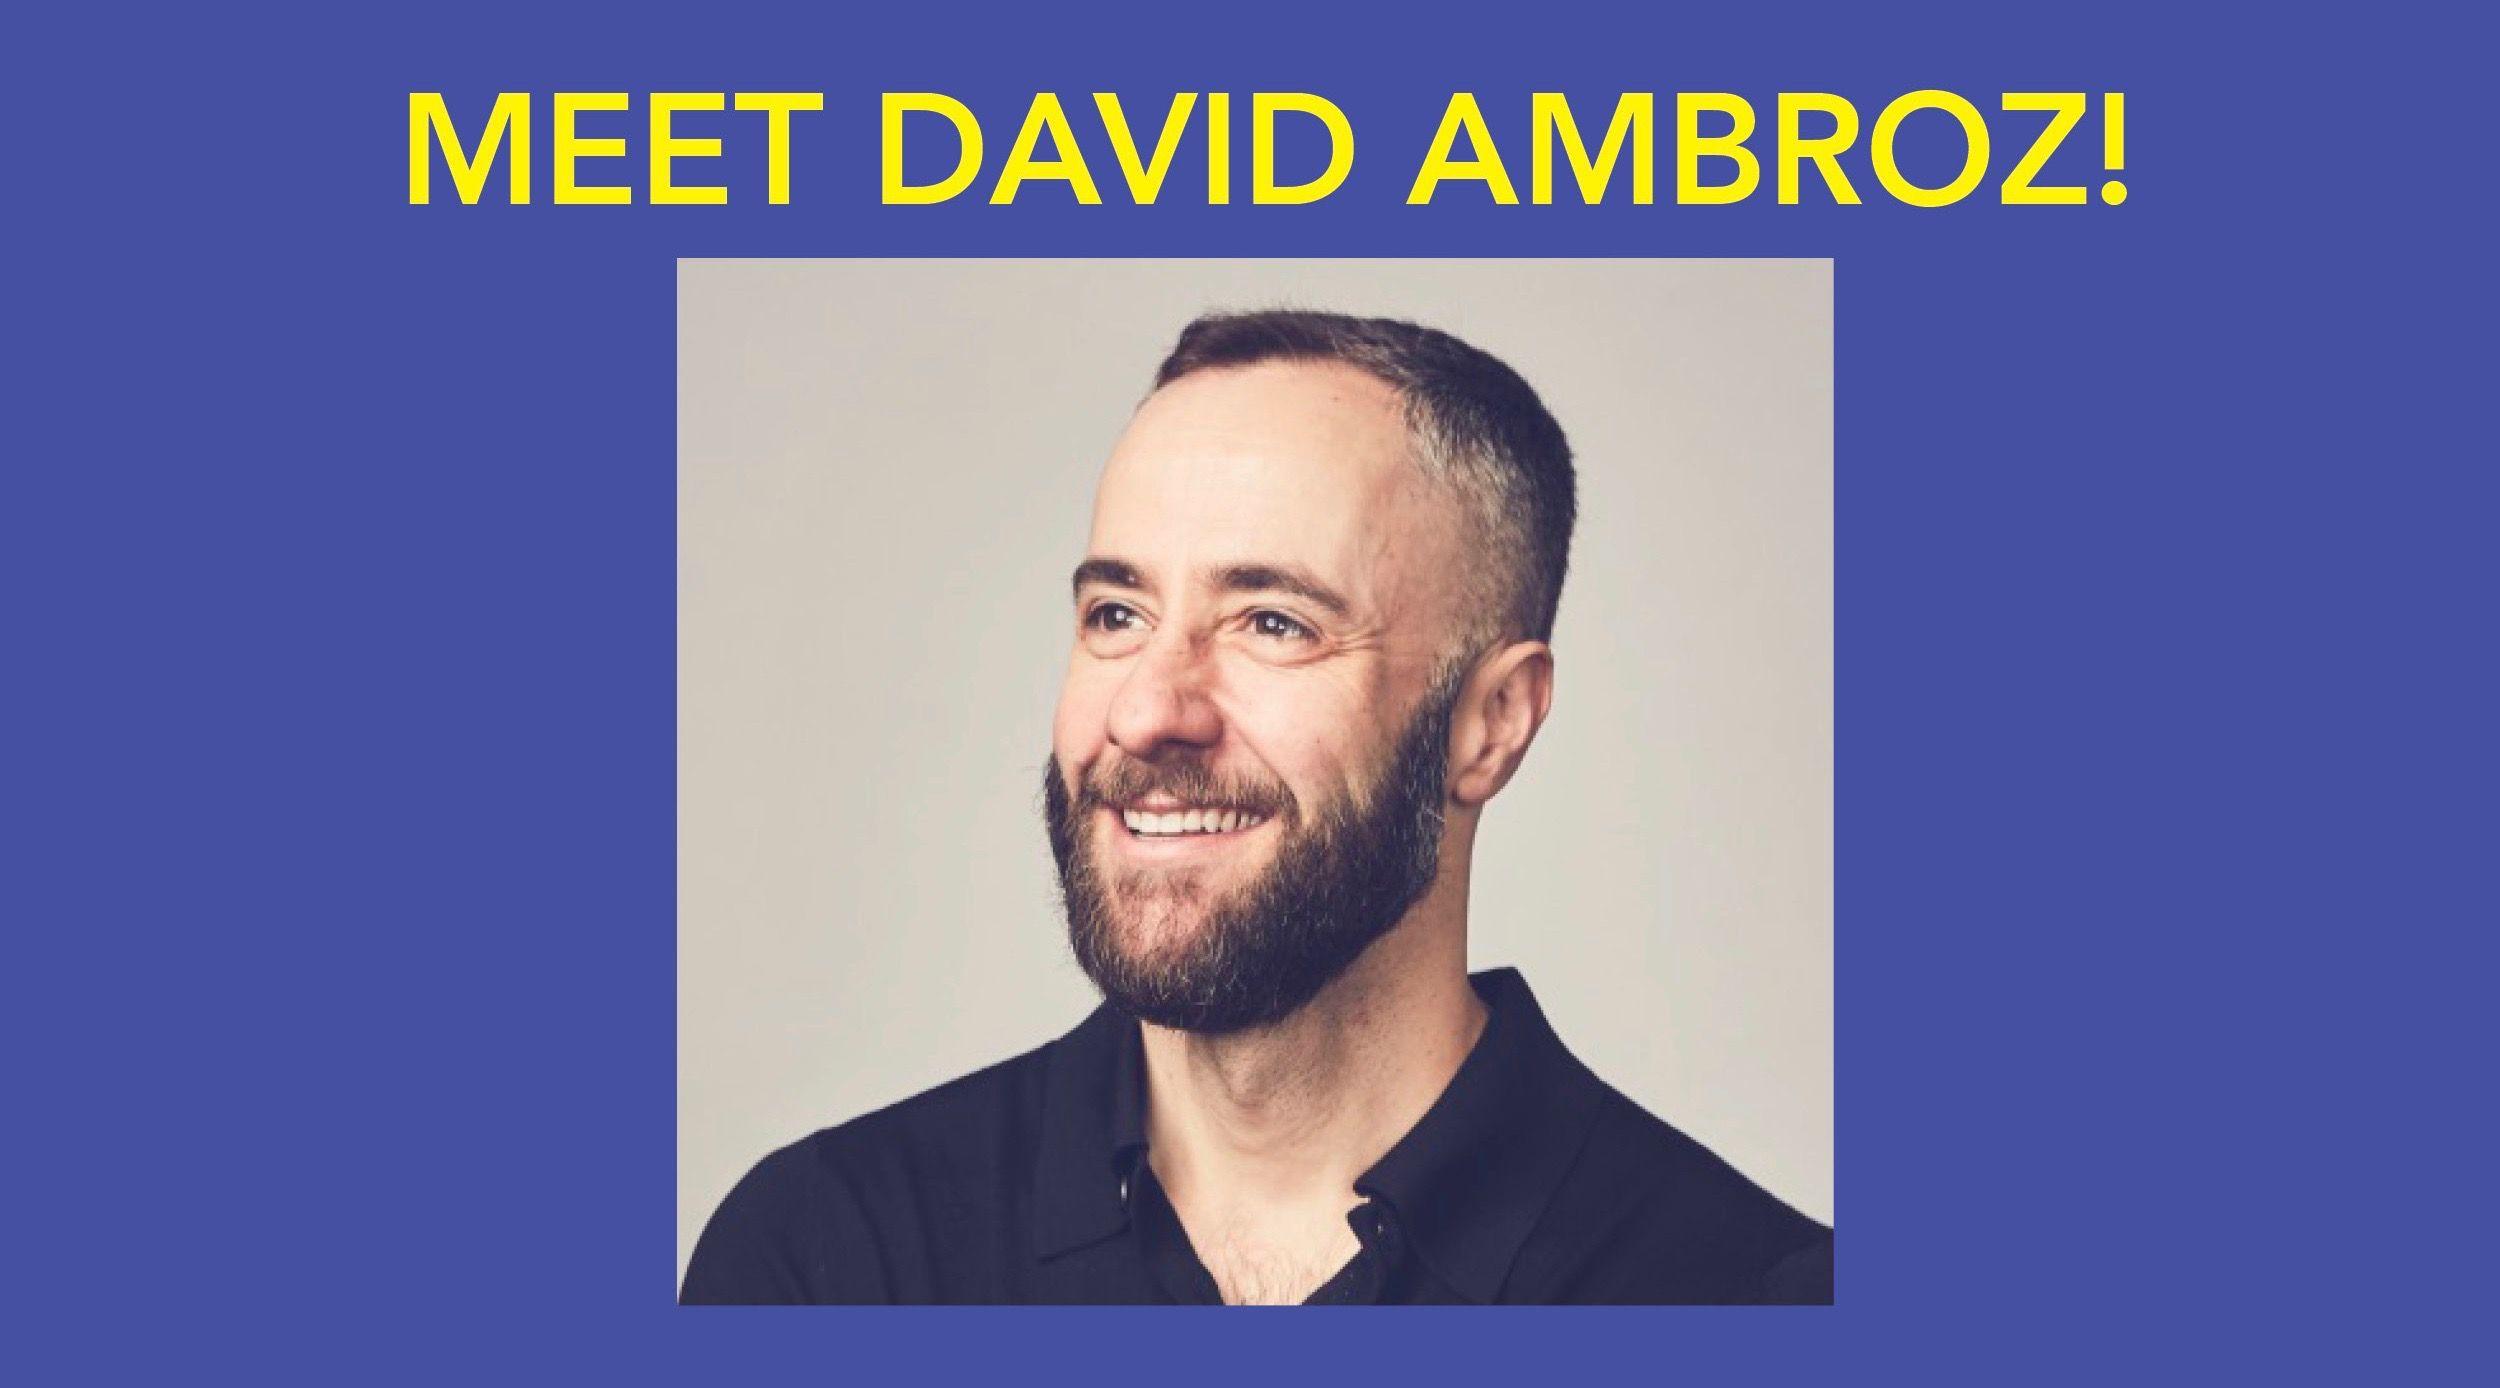 Meet David Ambroz